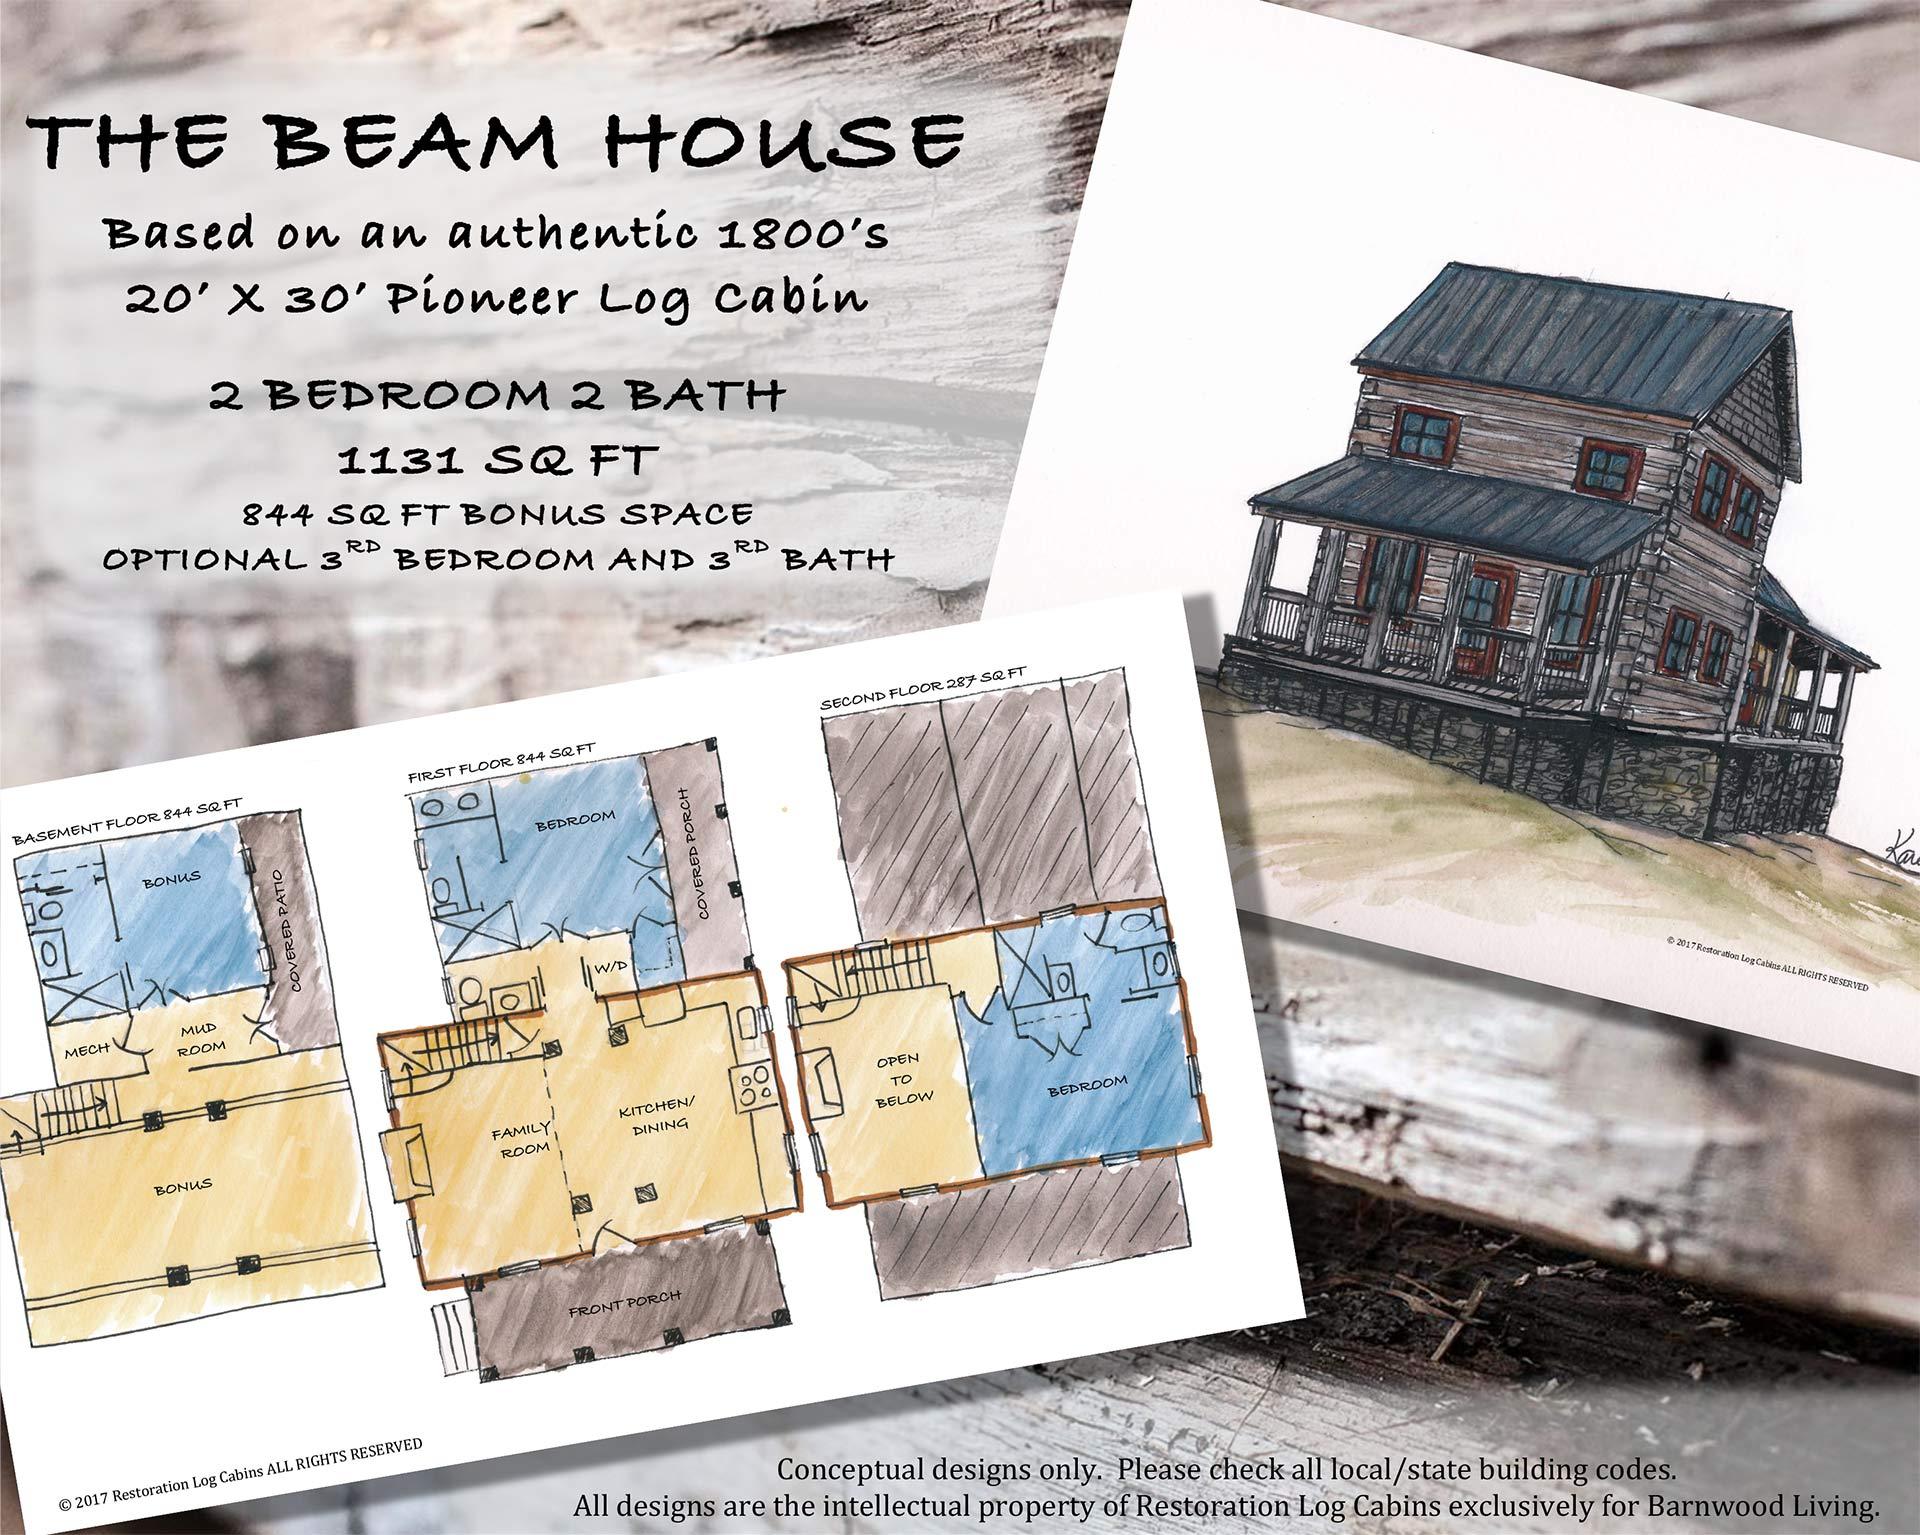 BEAM HOUSE LAYOUT